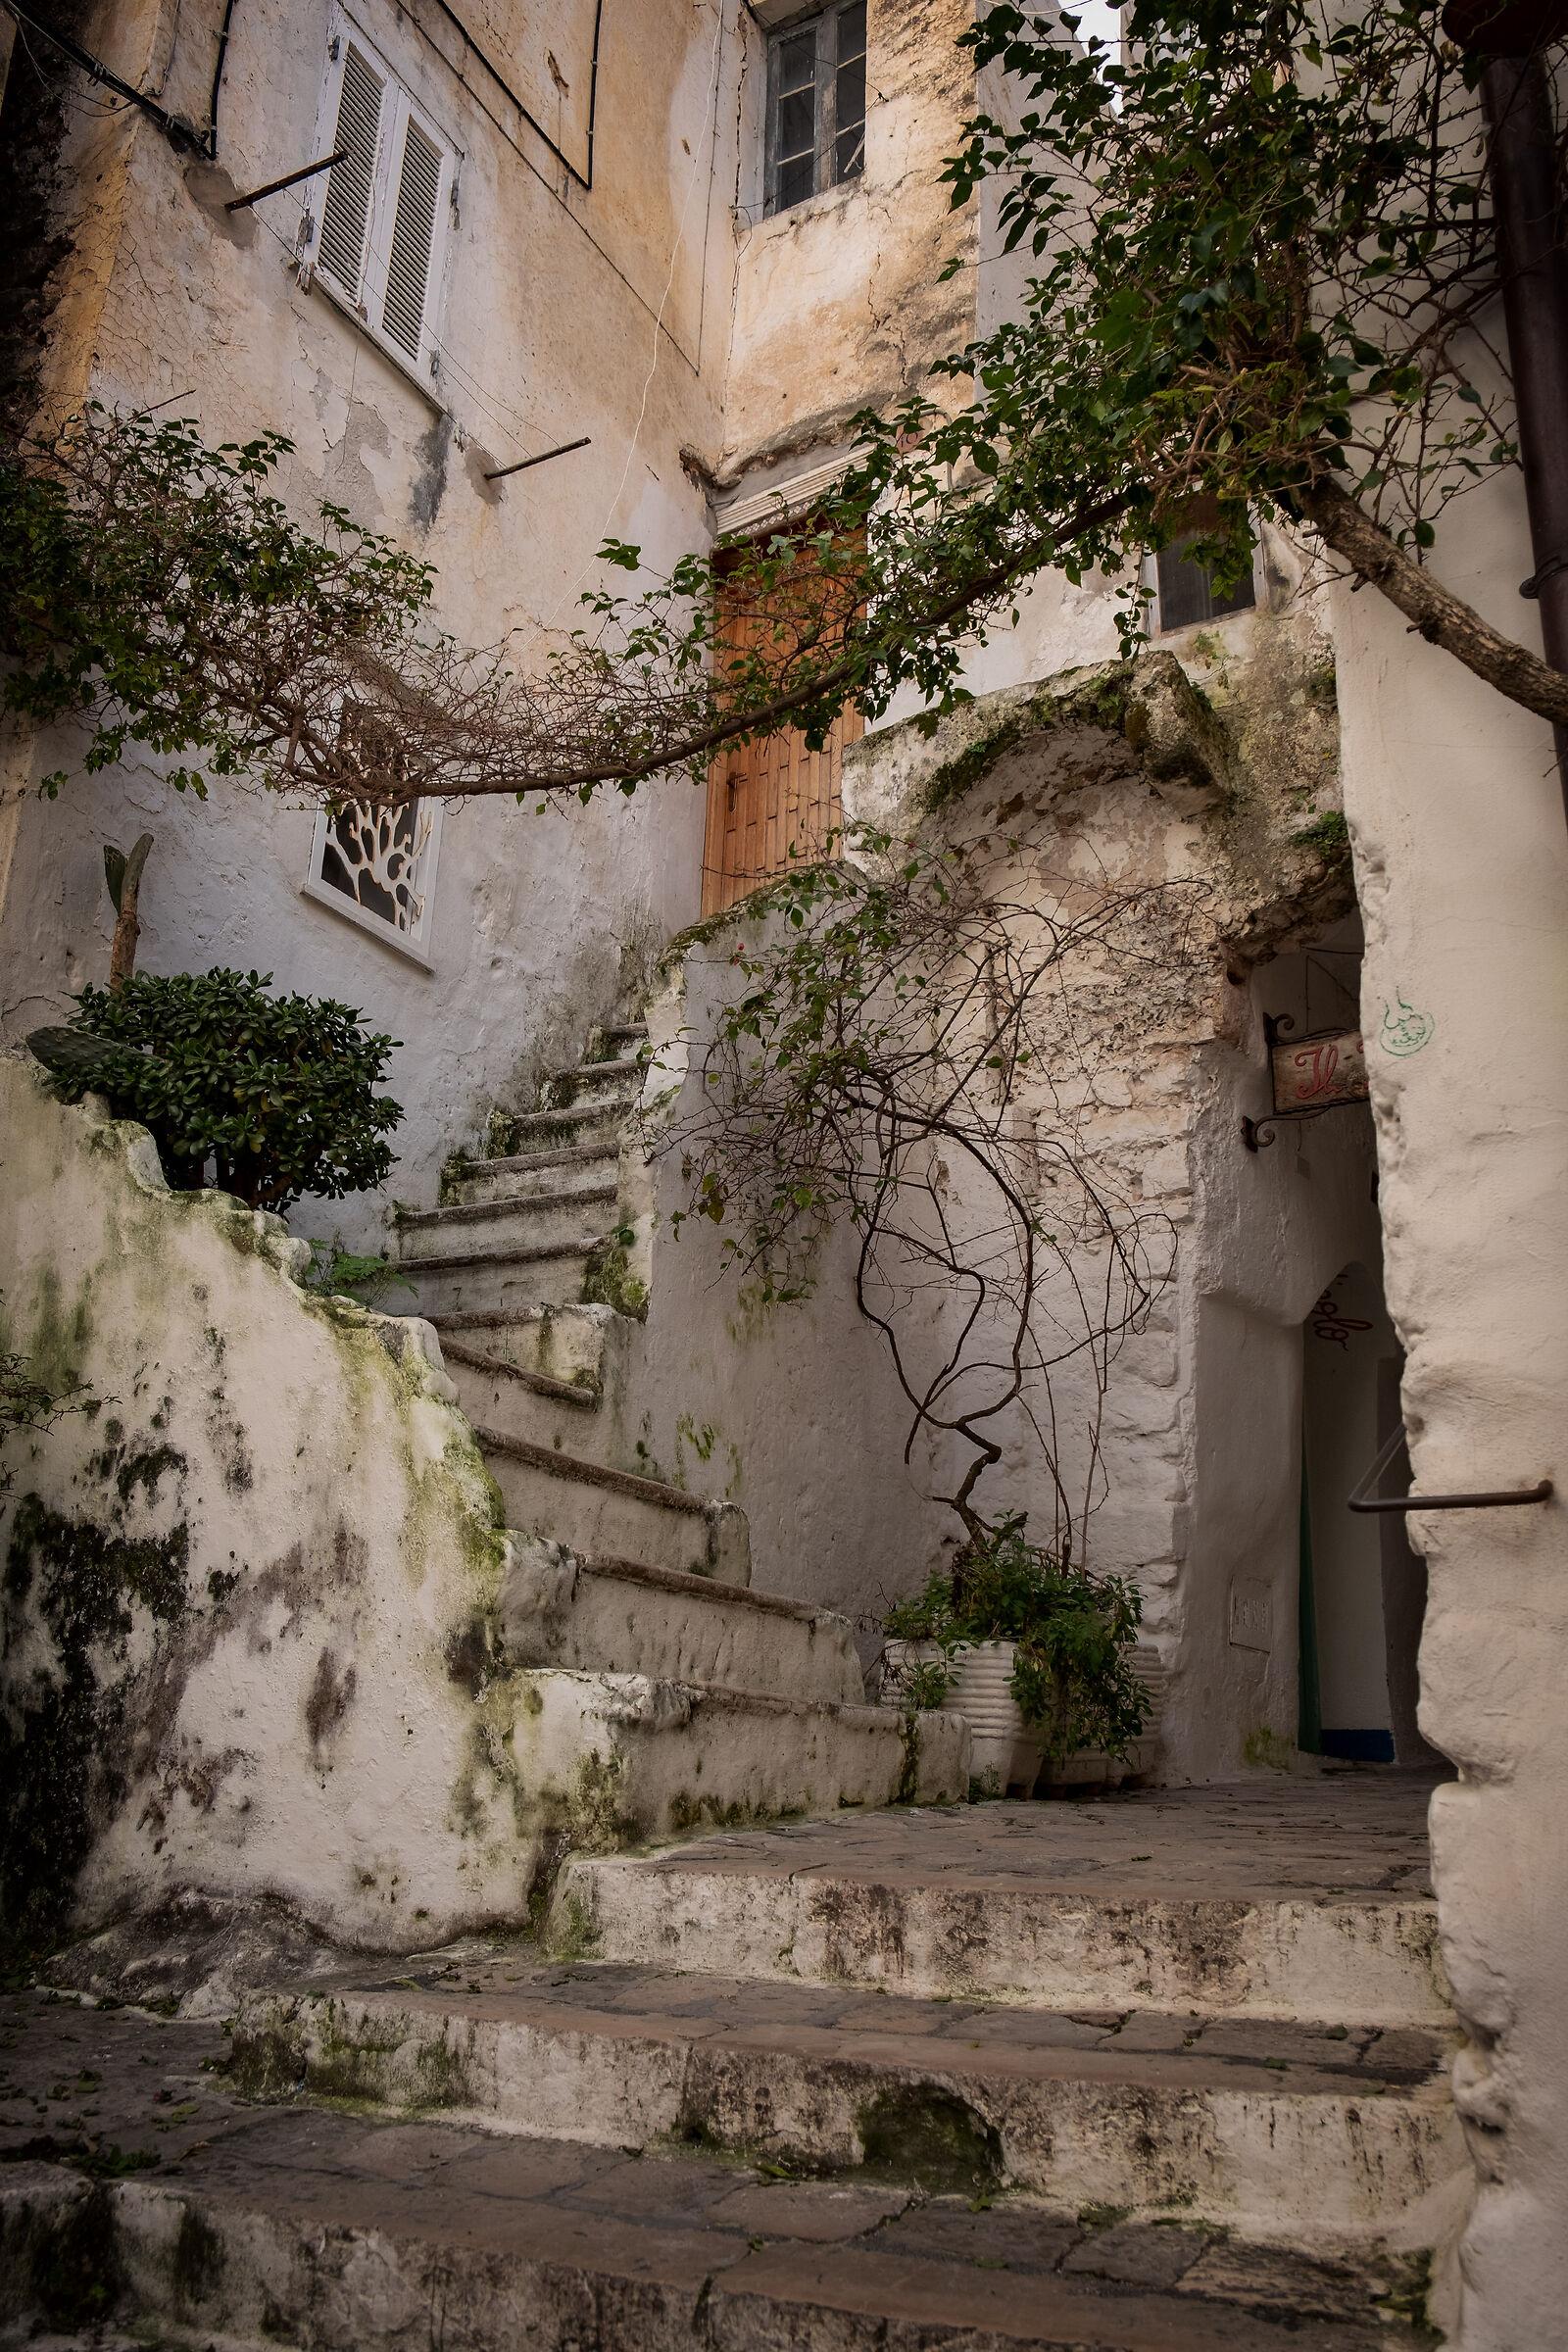 Alleys and ladders in Sperlonga...